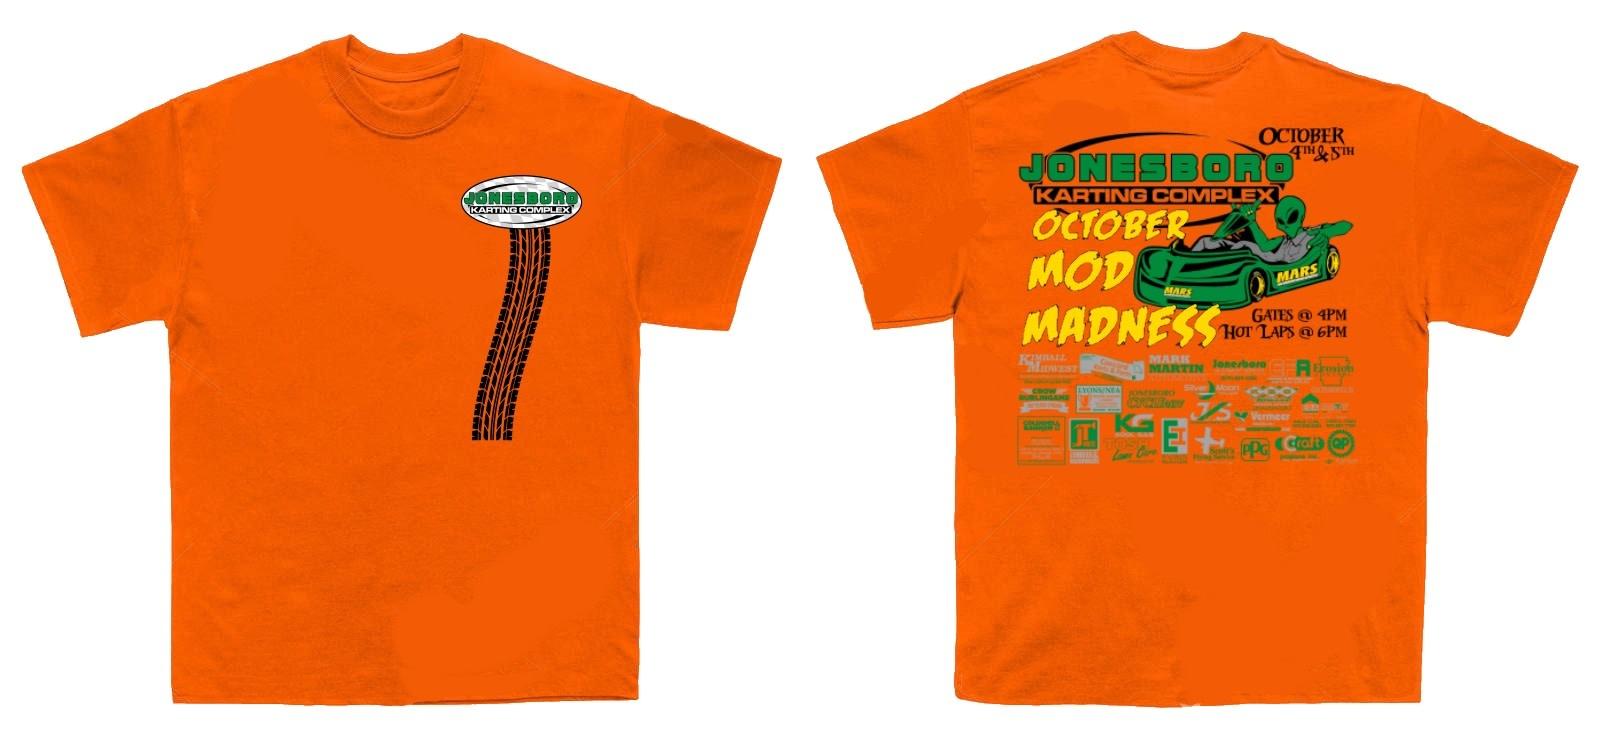 (preorder) 2019 Pro Mod Madness Shirt Adult X Large Orange